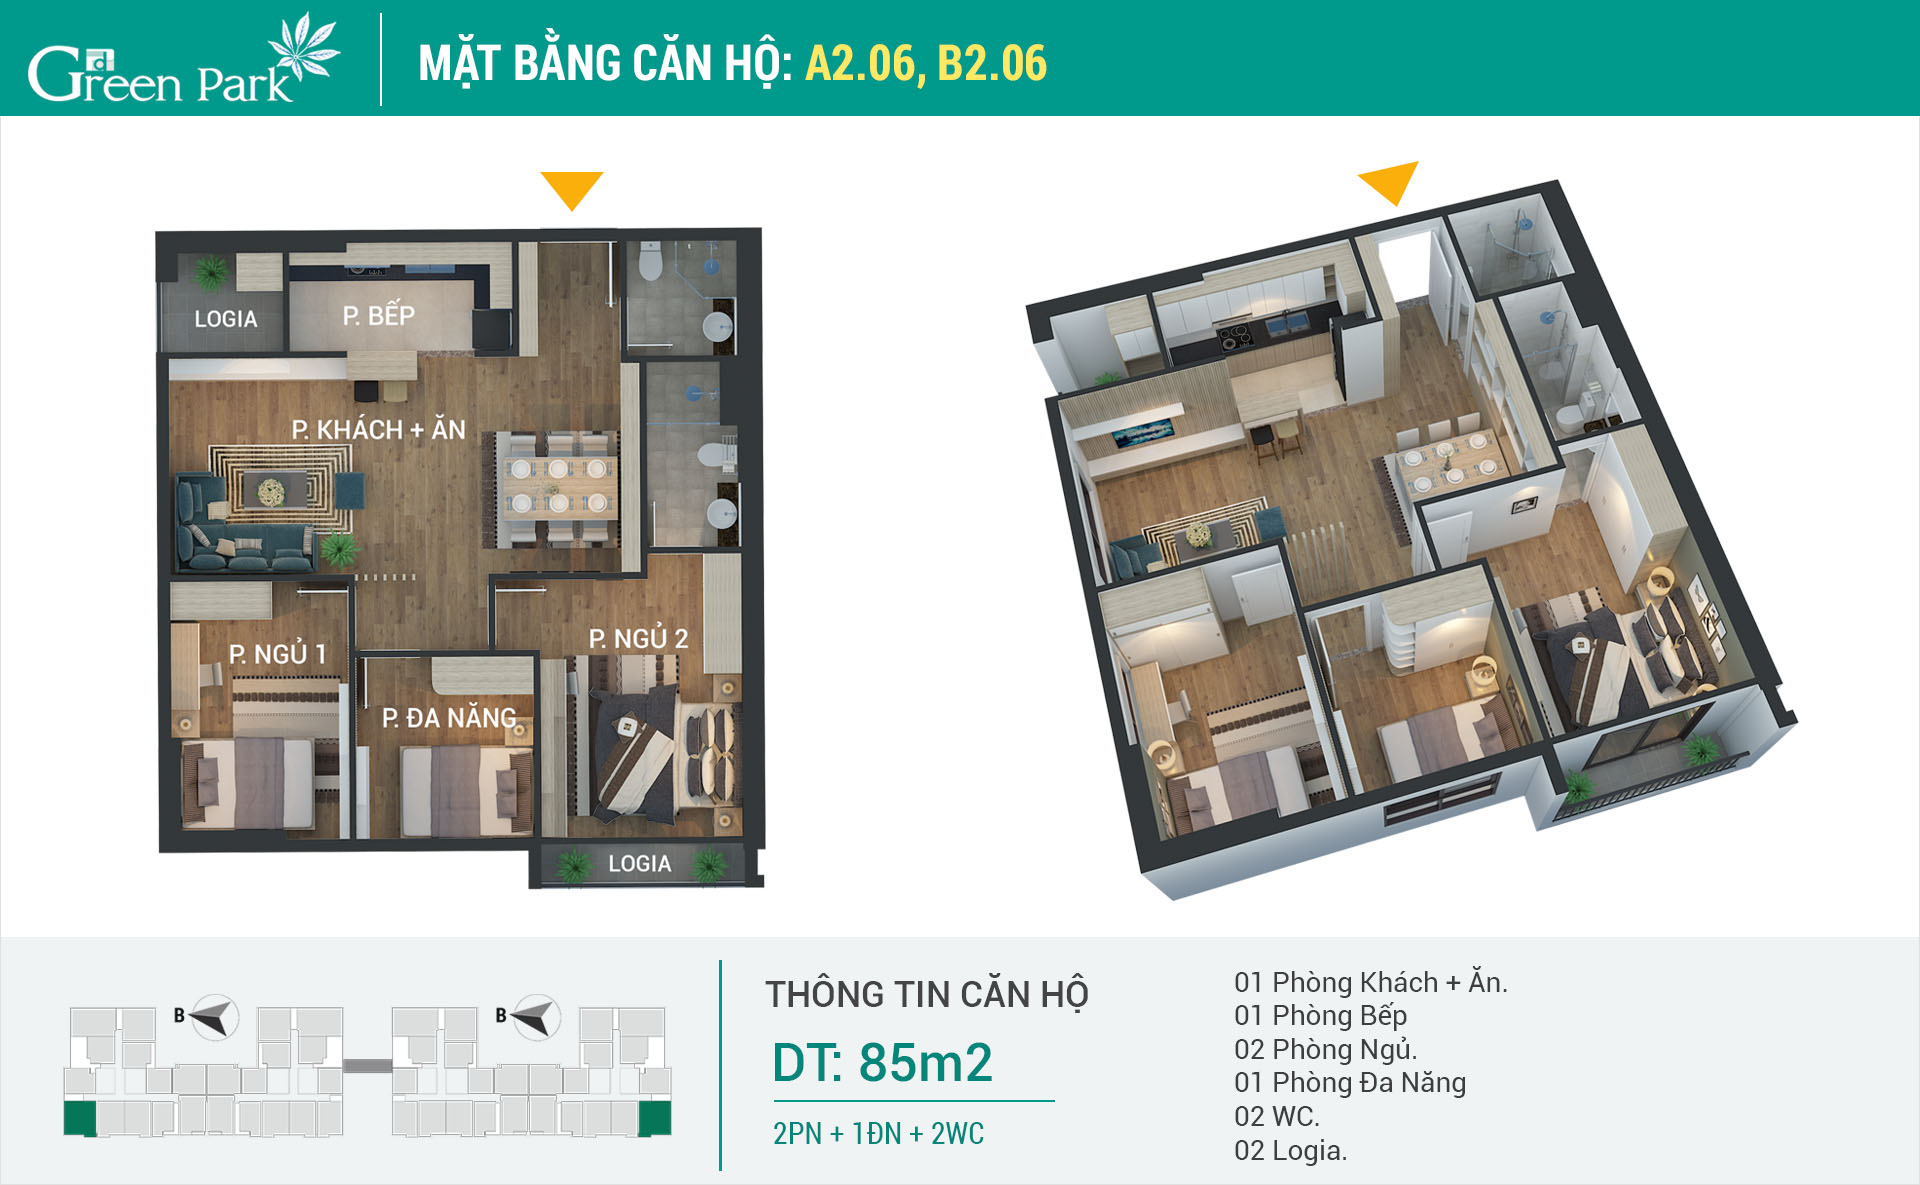 Mặt bằng căn hộ A2-06, B2-06